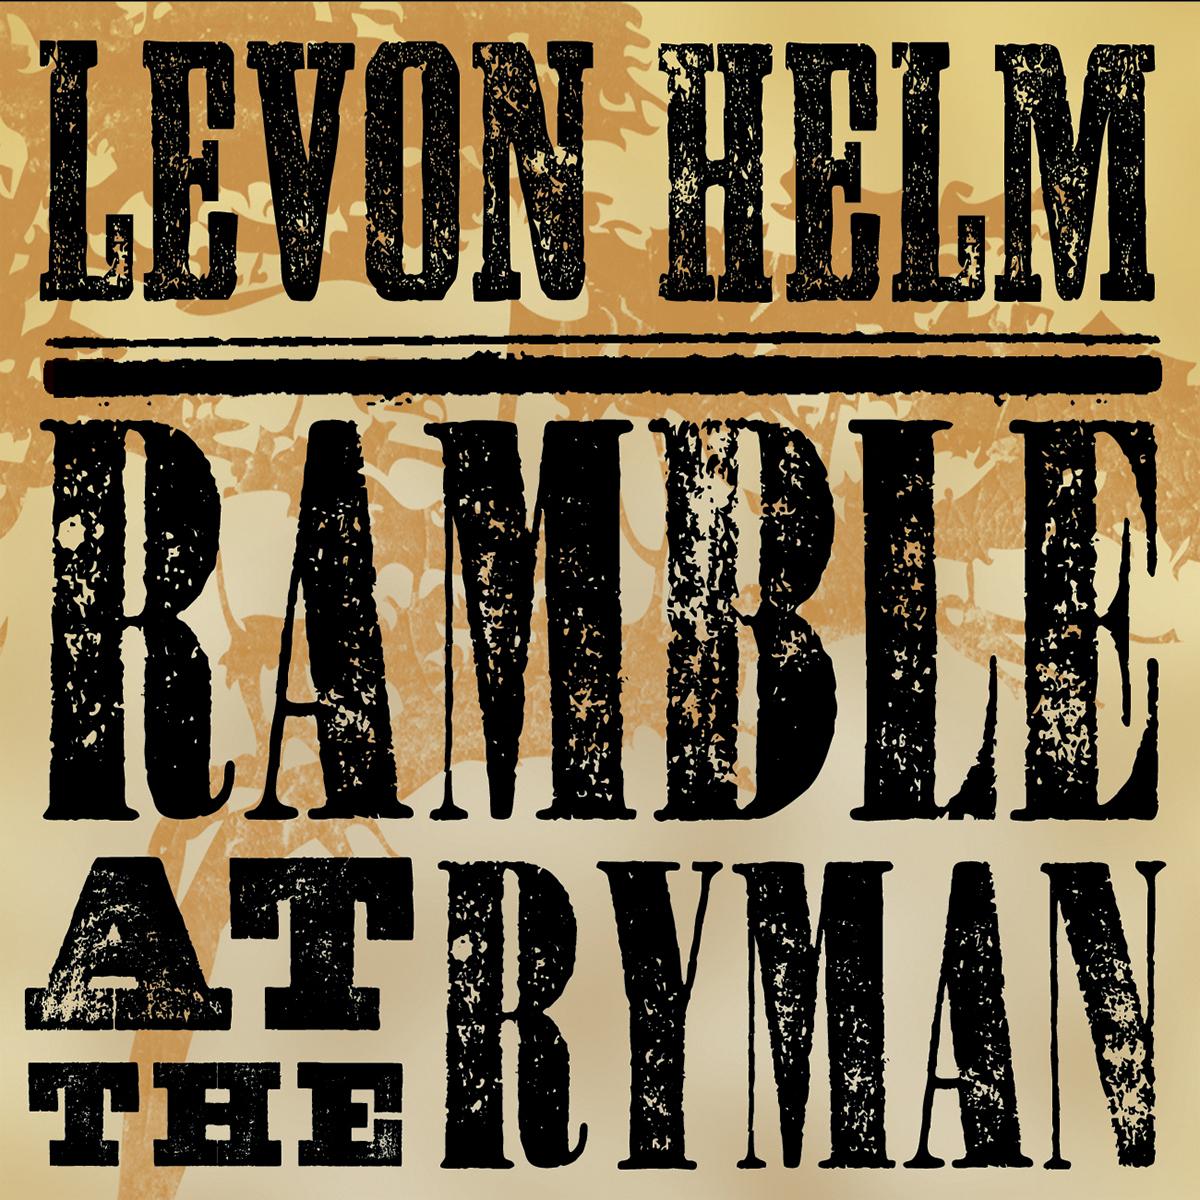 Levon Helm - Ramble at the Ryman MP3 Download